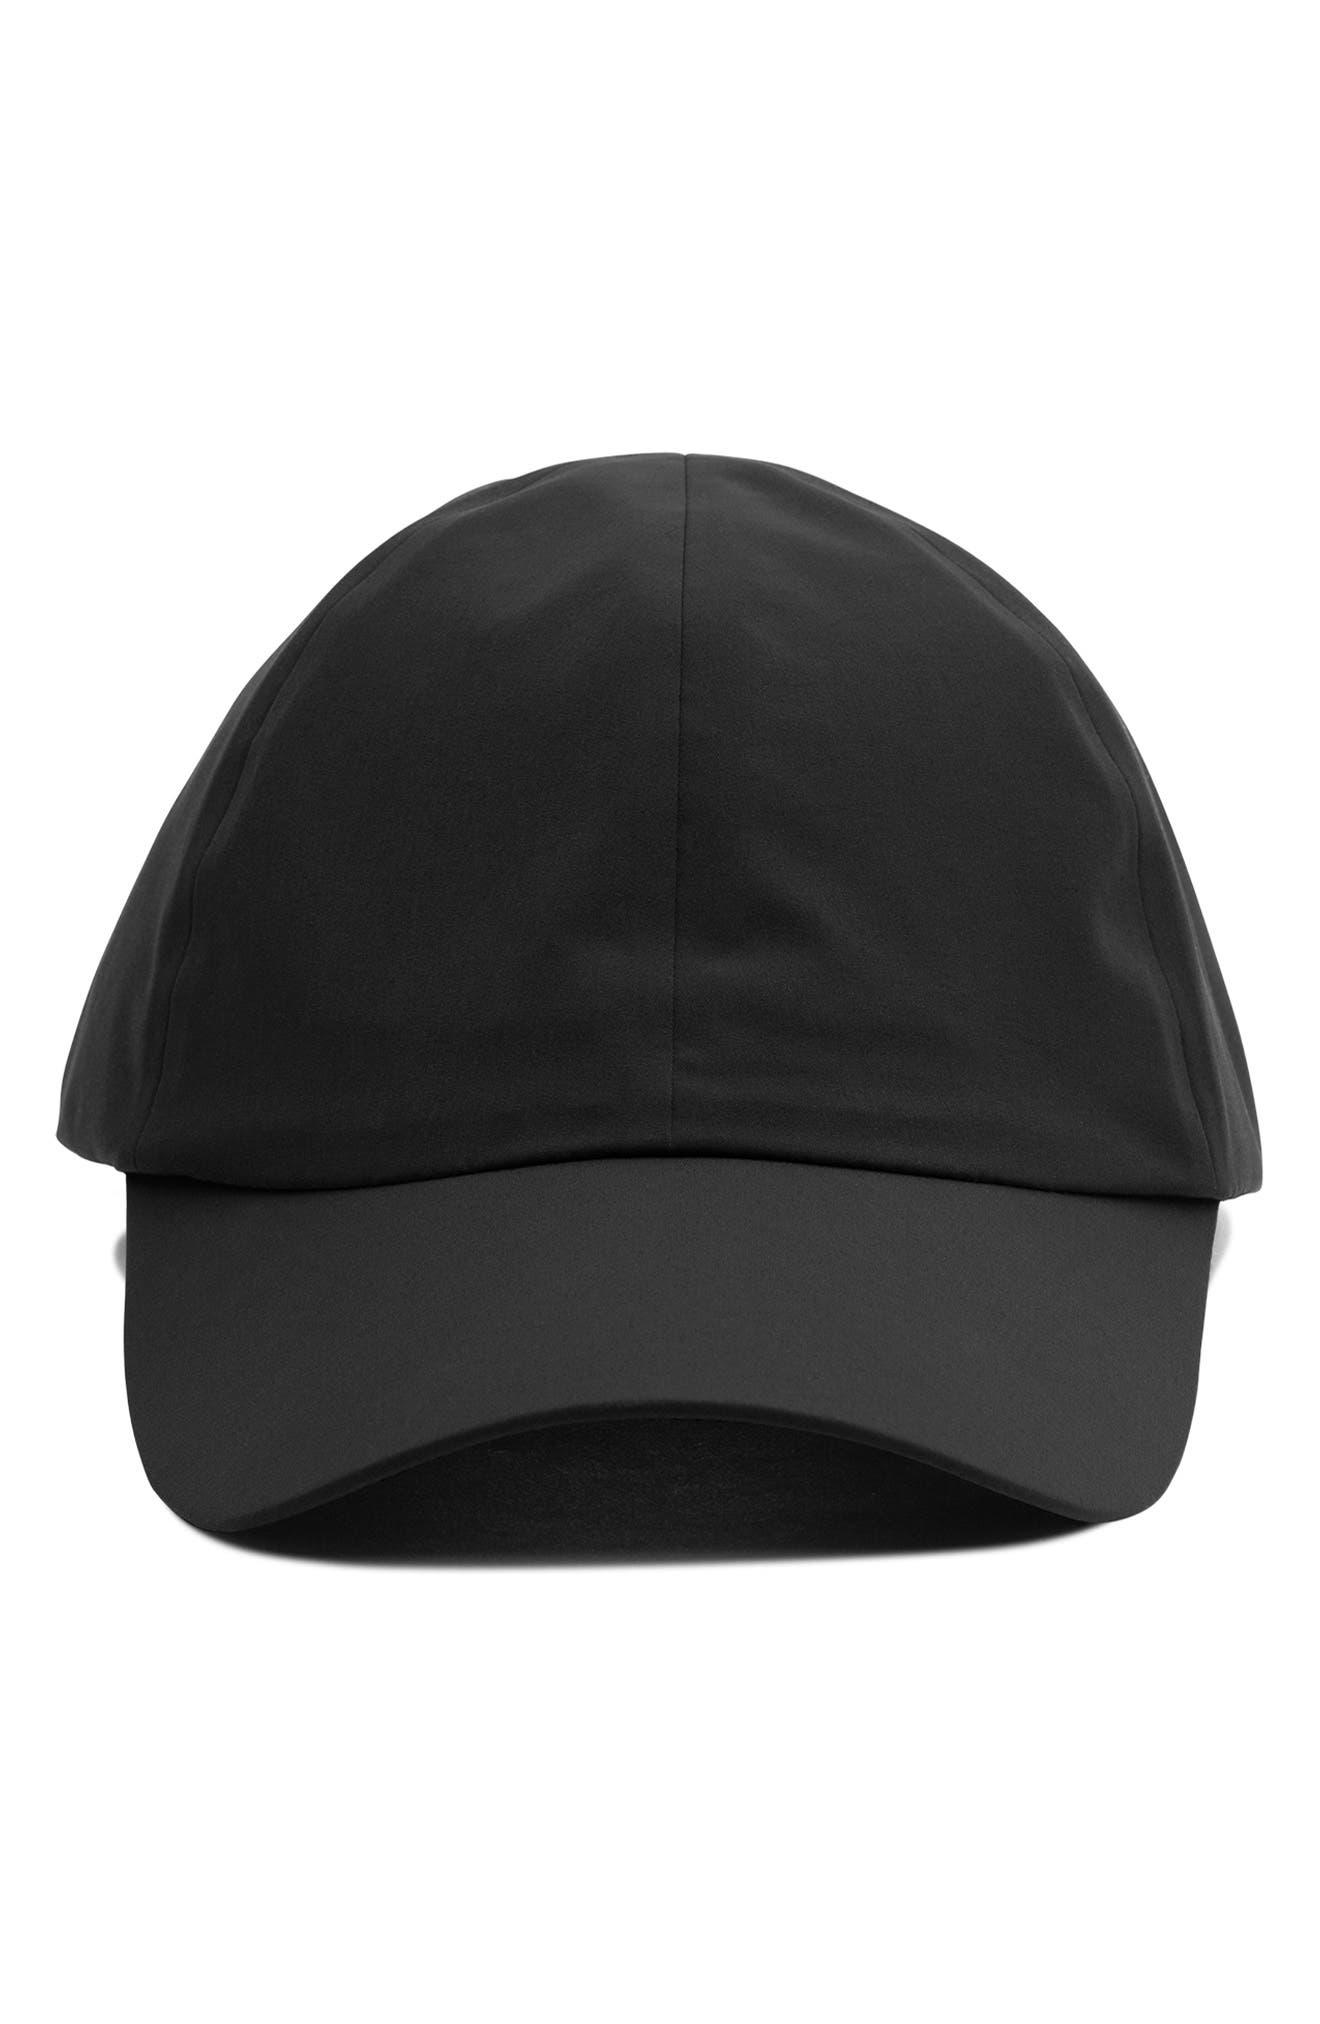 Waterproof Nylon Ball Cap,                             Alternate thumbnail 2, color,                             BLACK